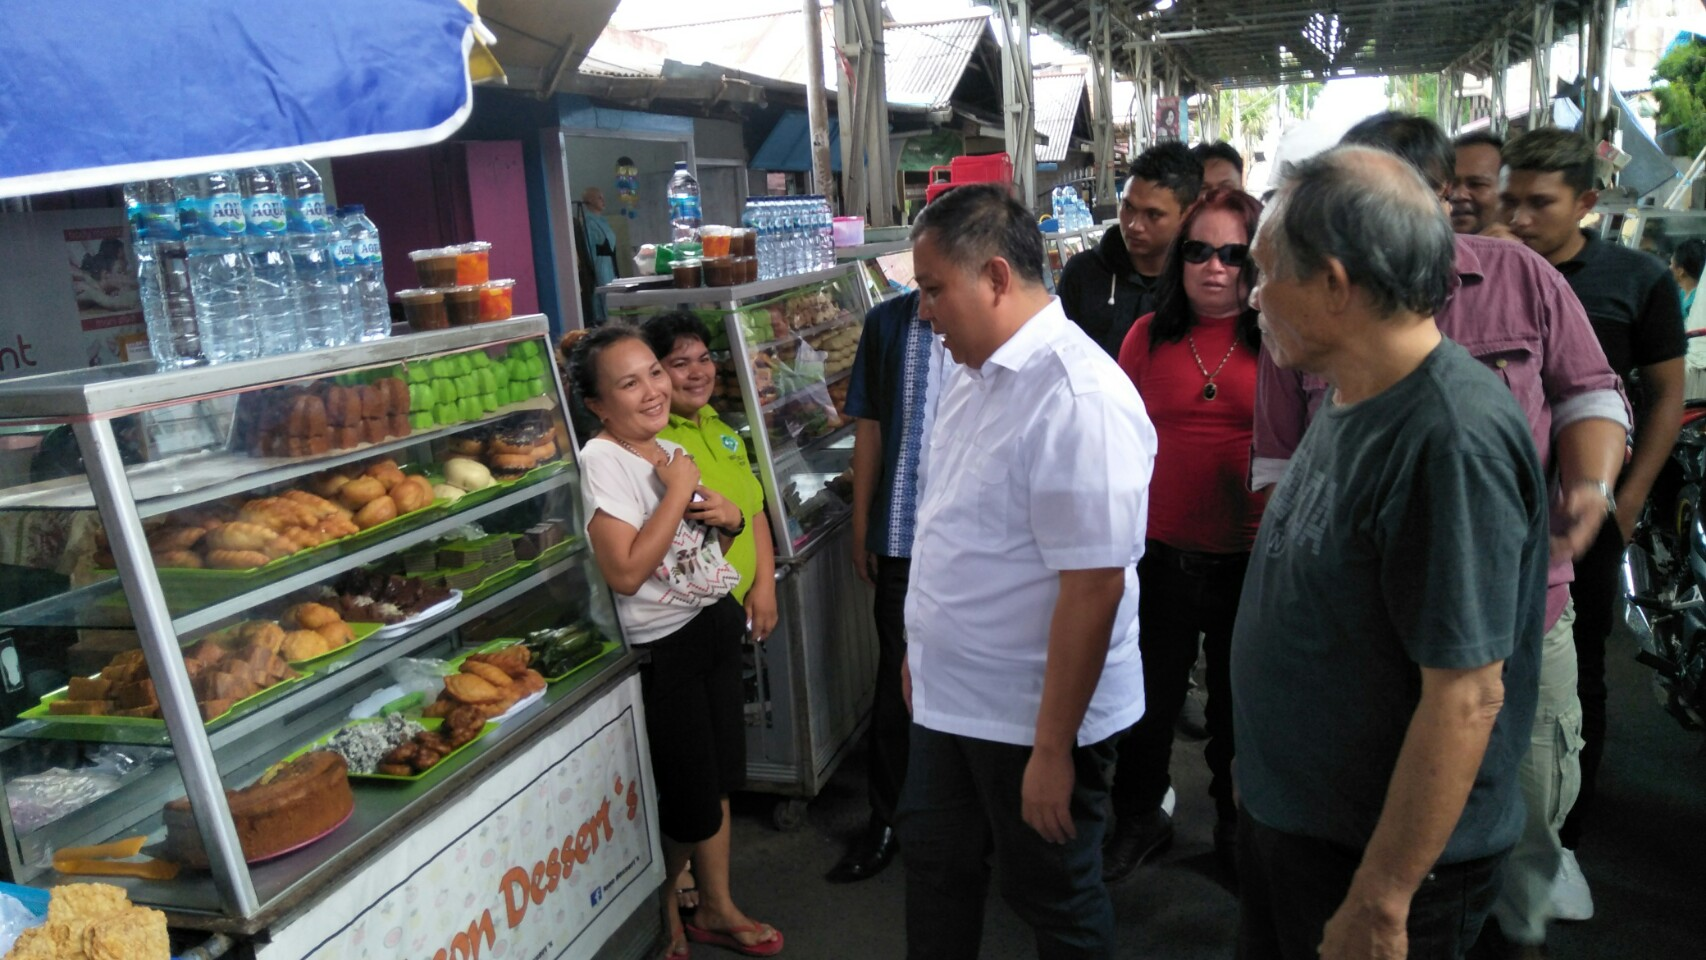 Pedagang Kue dan Makanan Sambut Roland Roeroe, Saat Sambangi Kawasan Kuliner Tomohon